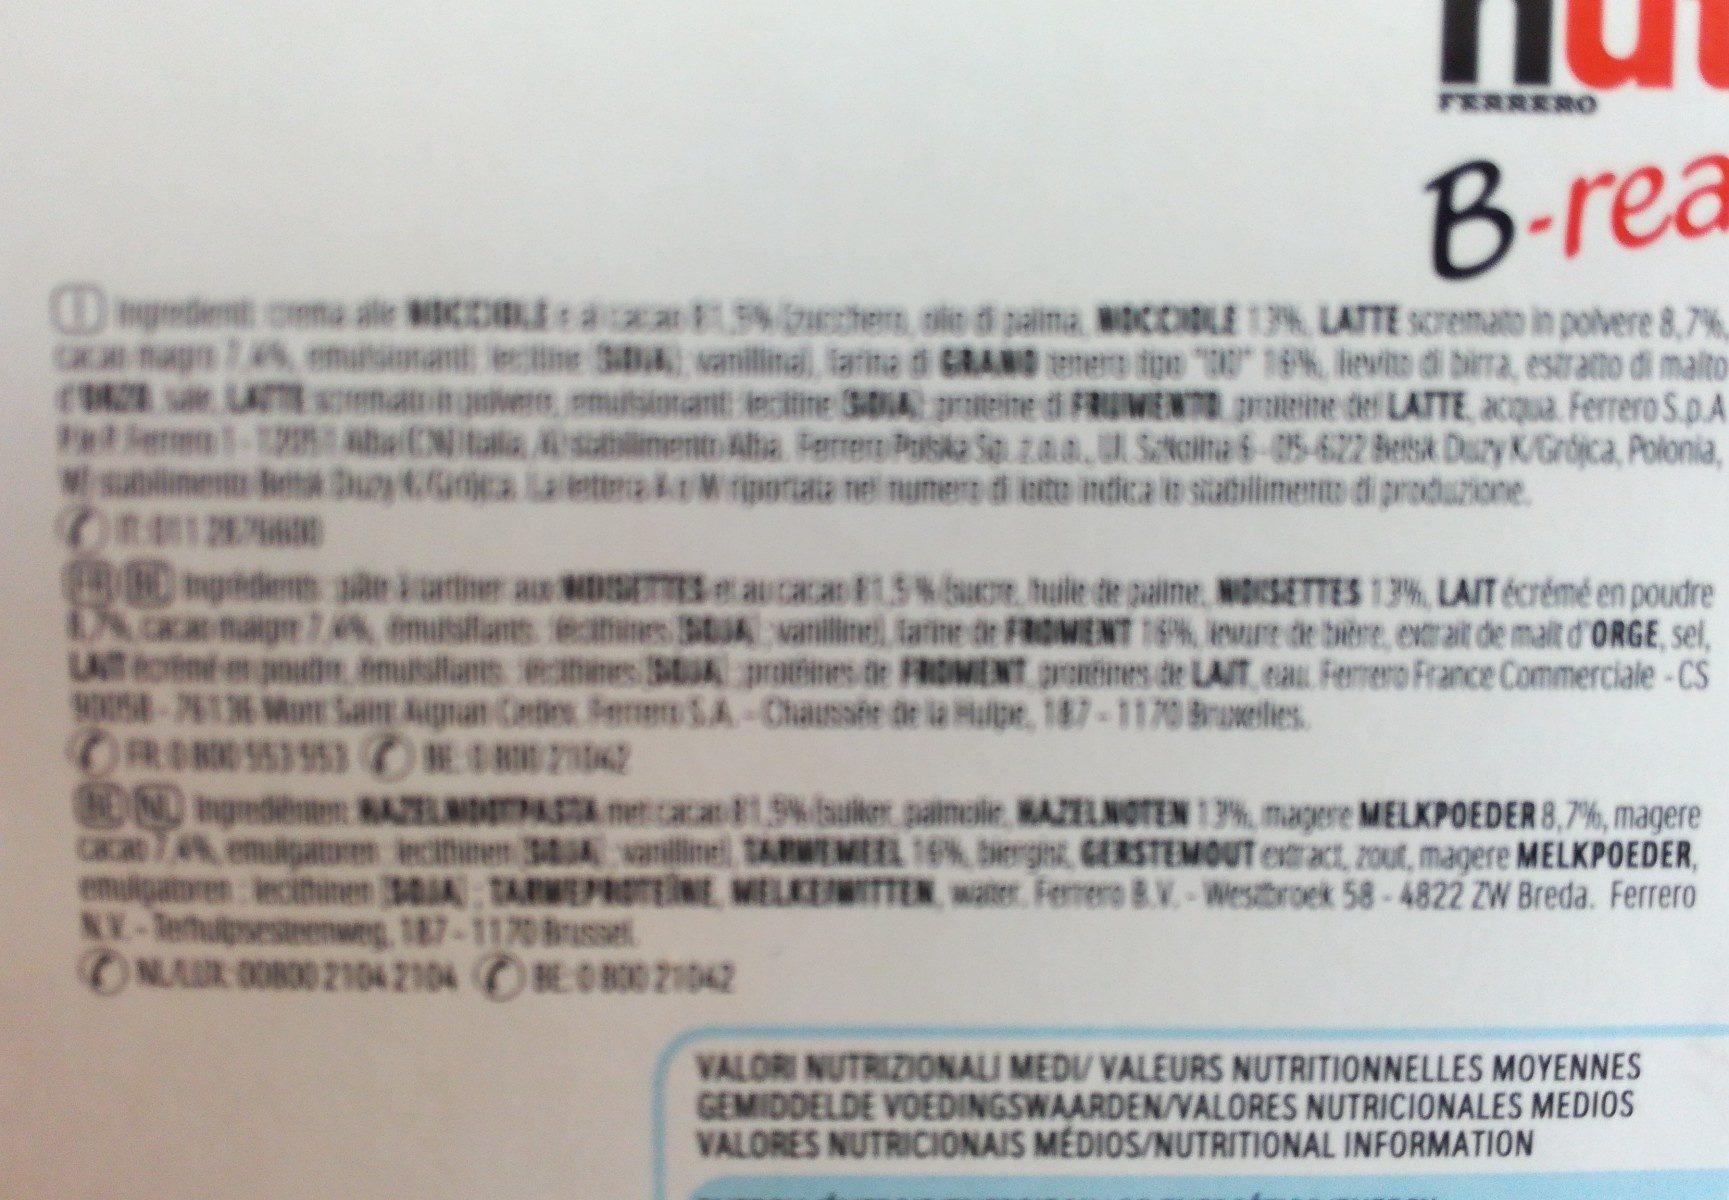 NUTELLA B-READY biscuits 330g paquet de 15 pièces - Ingredienti - fr